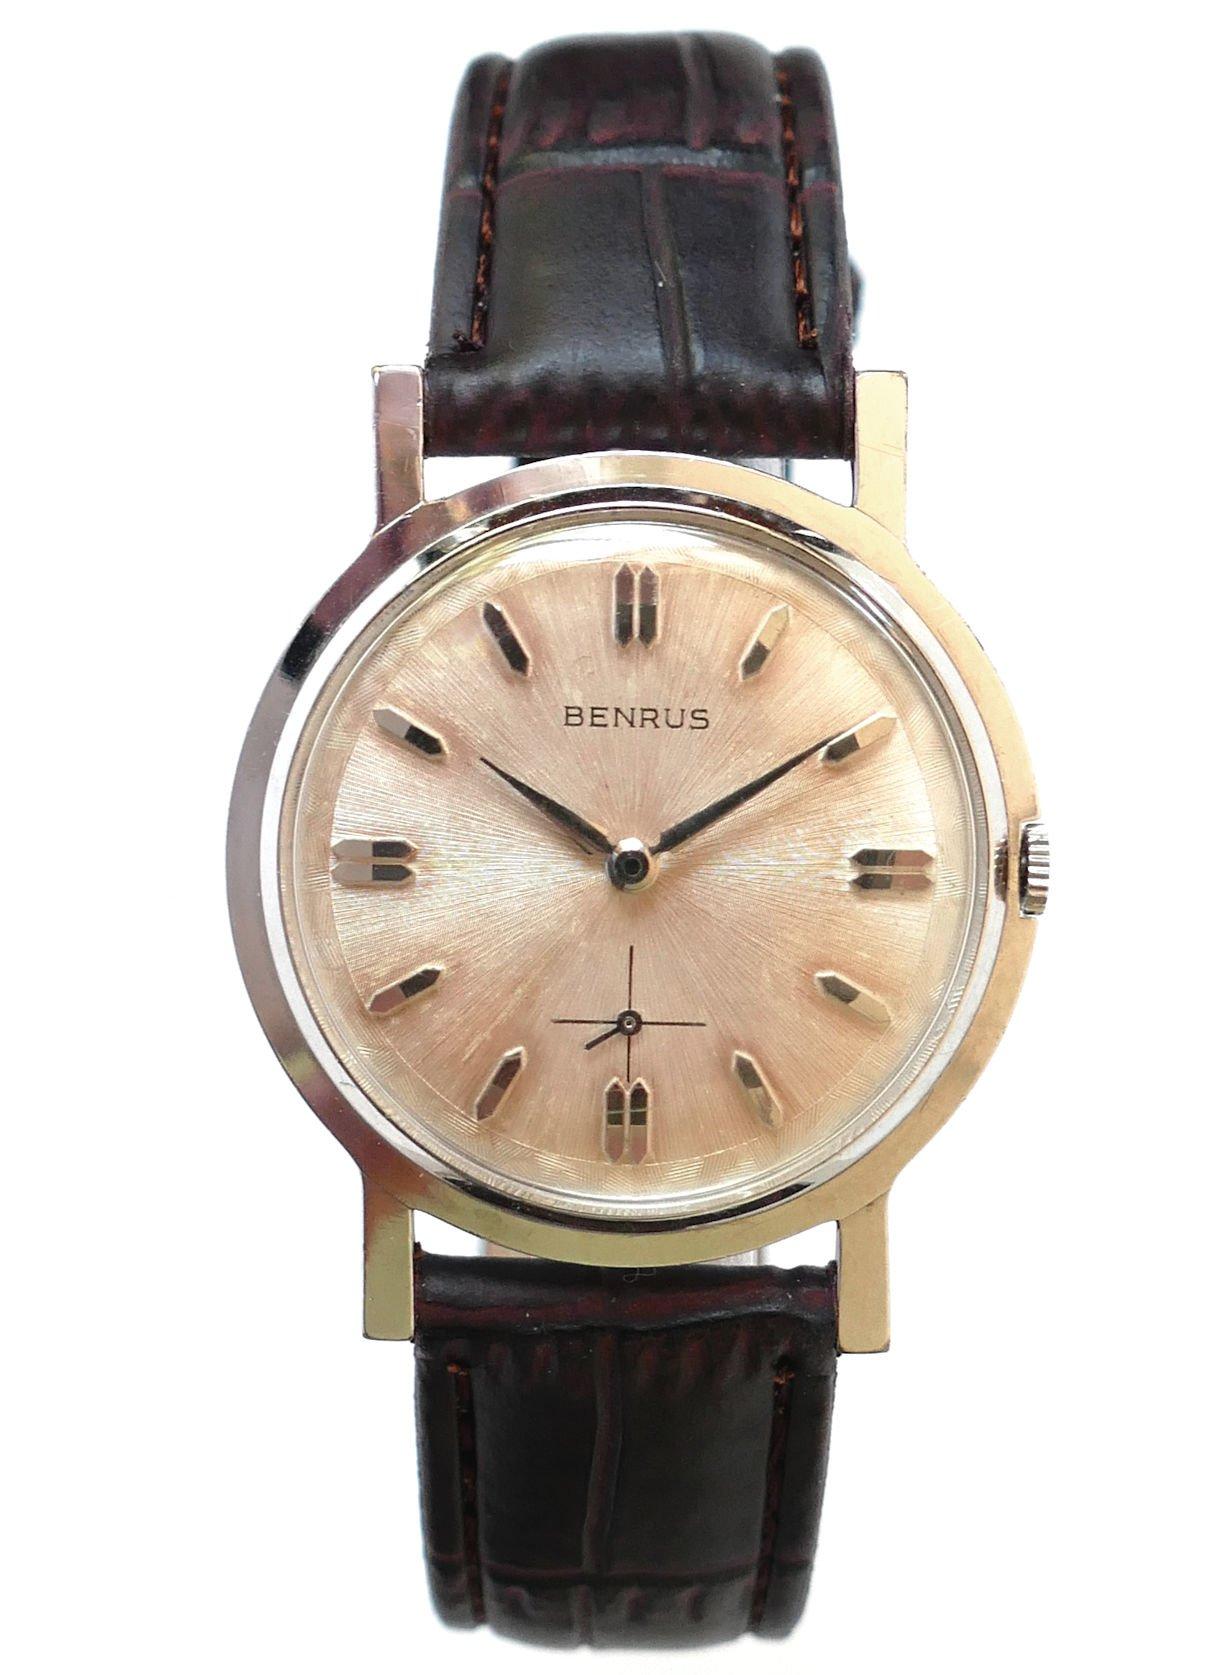 Benrus Men's Vintage Watch